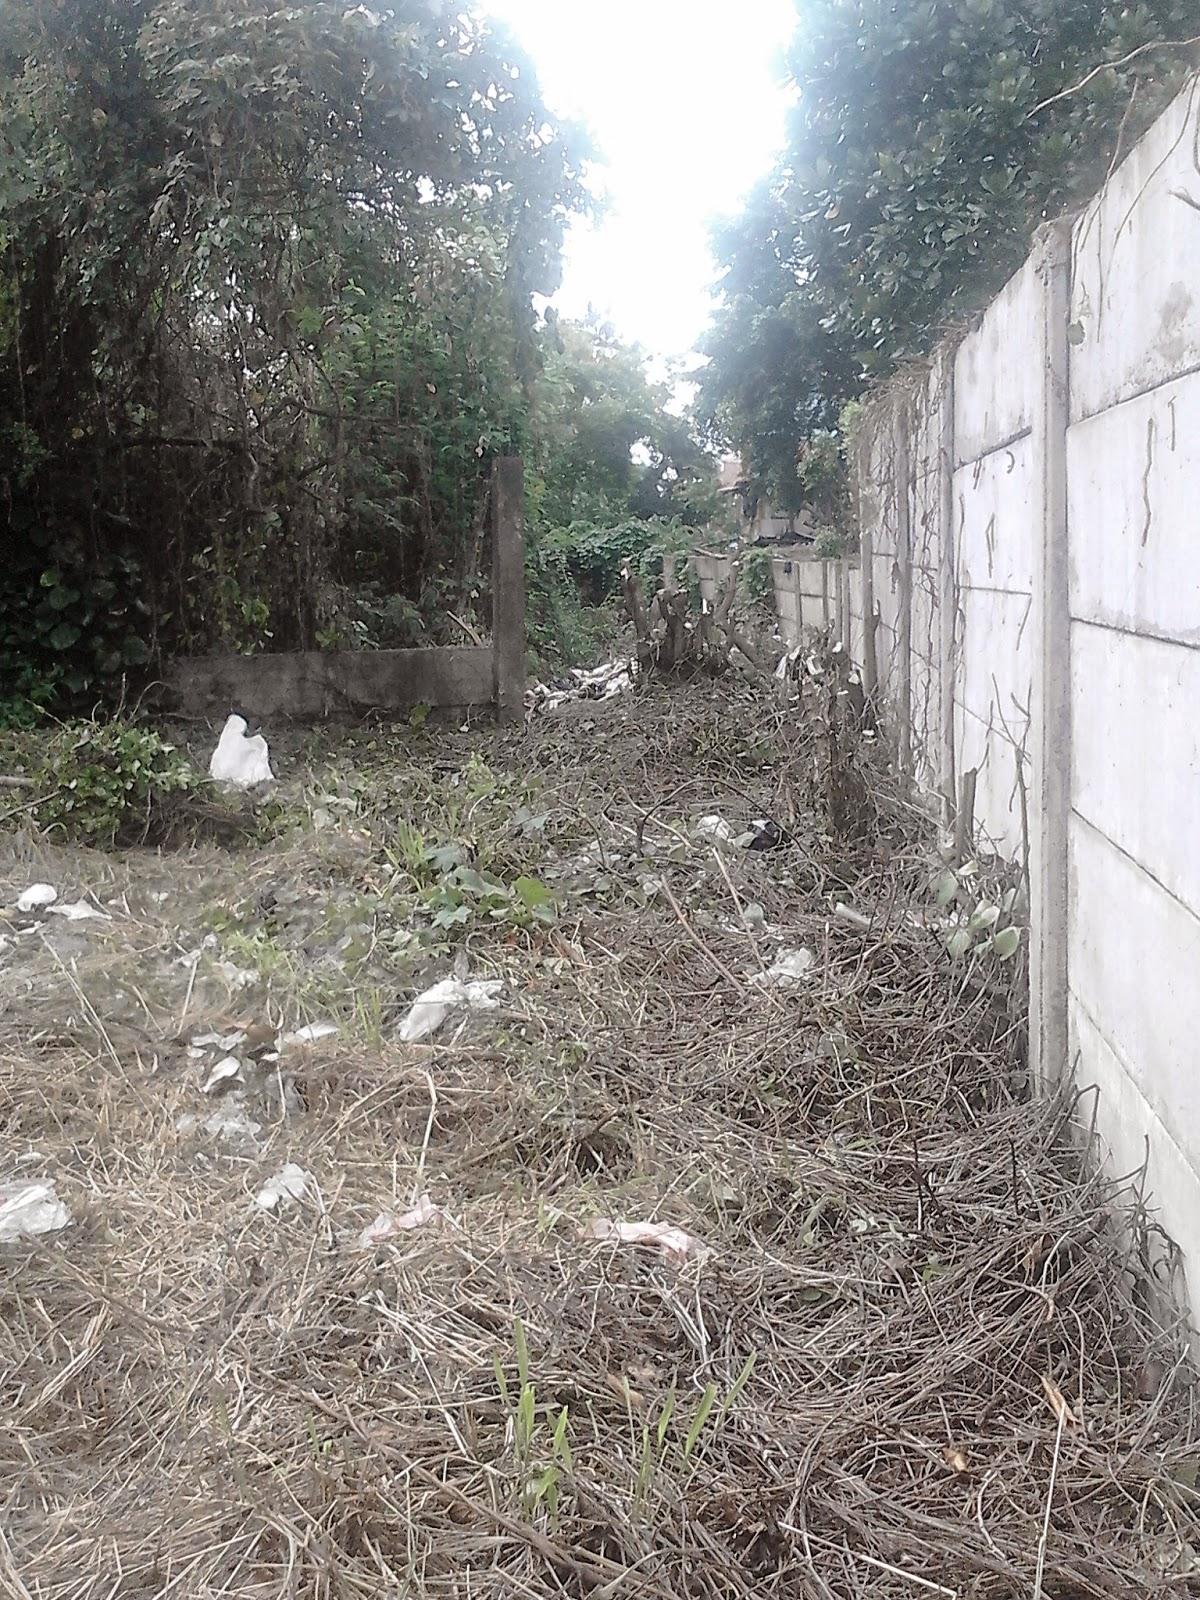 Jasa potong rumput dan perapihan lahan